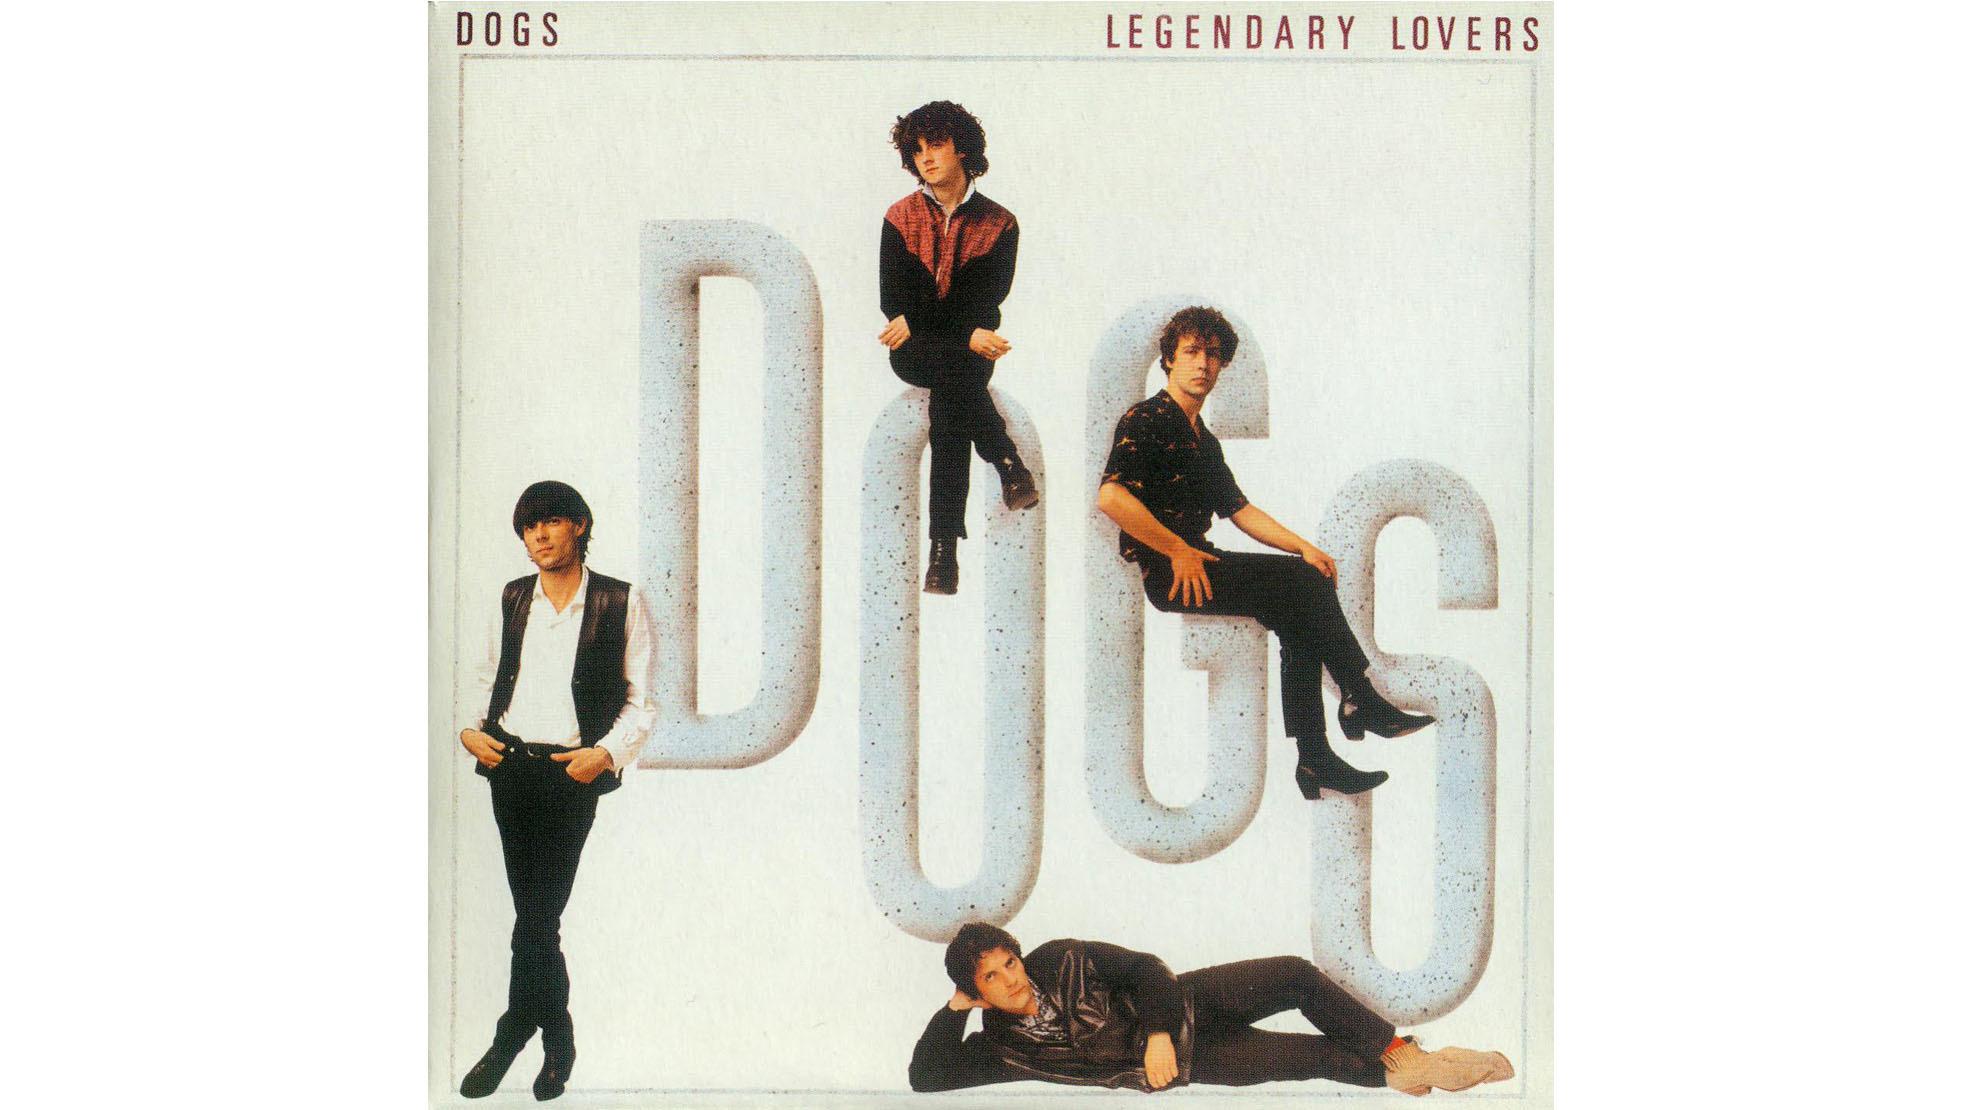 Les Dogs • Legendary Lovers (1983)